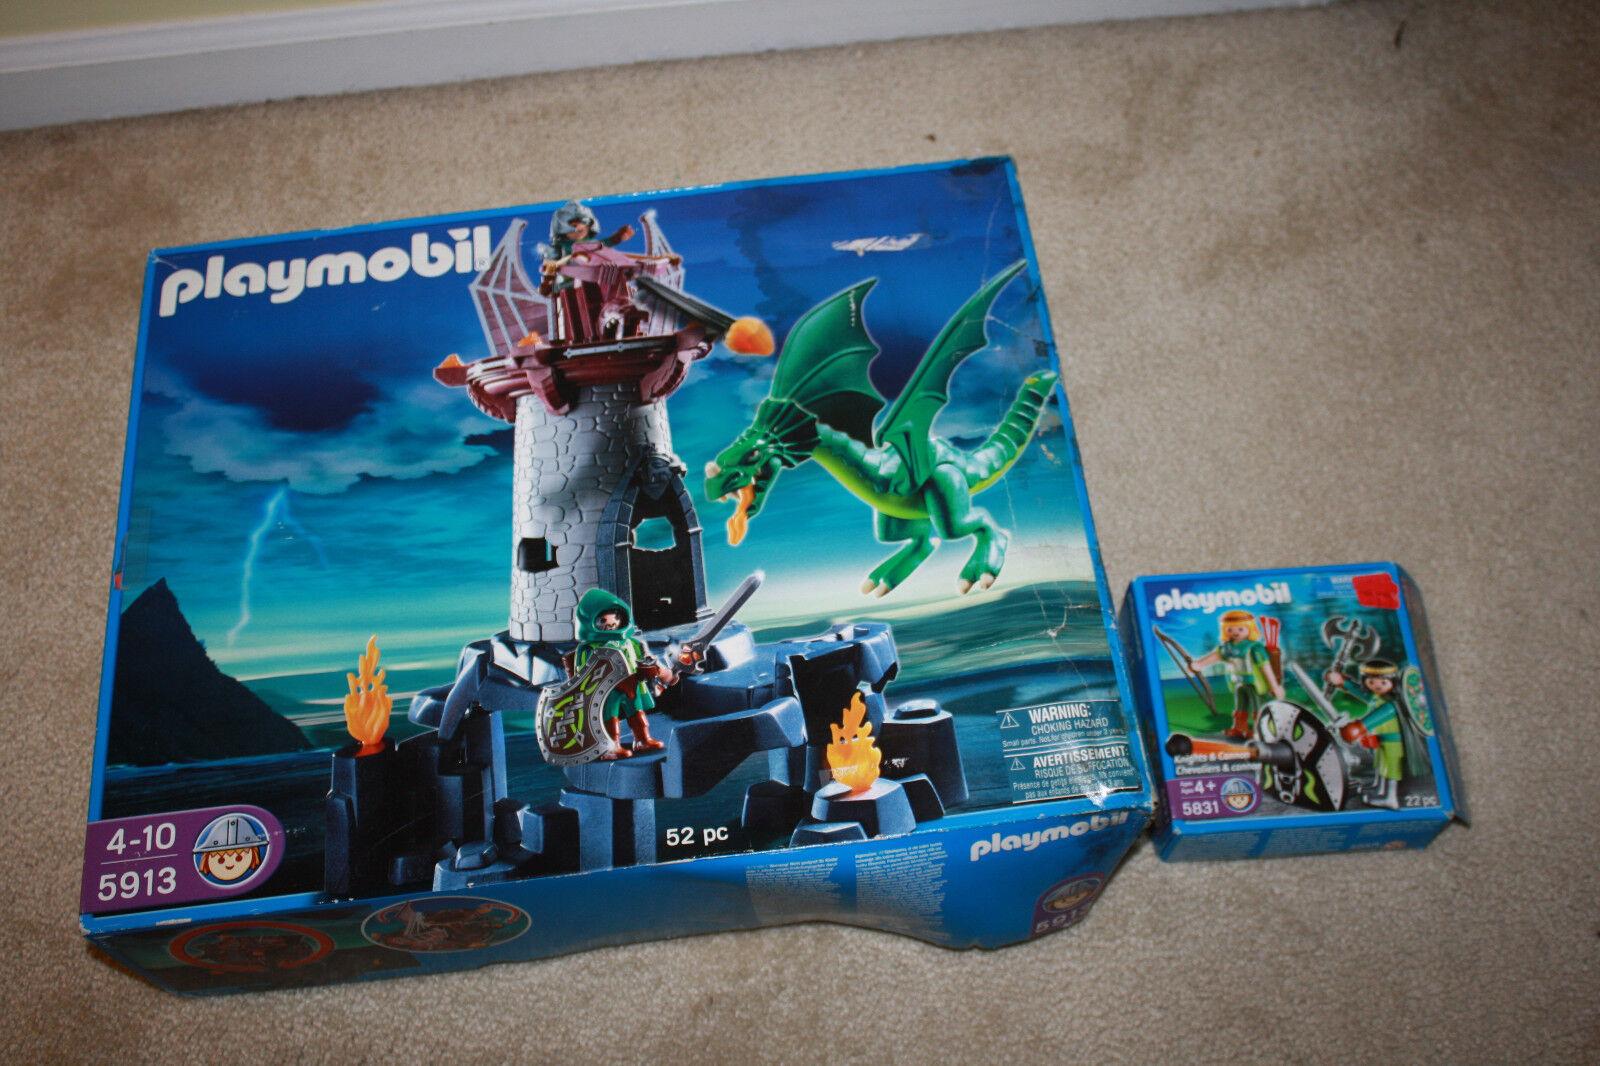 Playmobil 5913 Dragon attaque Tour et 5831 Chevaliers & CANNON-NEUF-R515